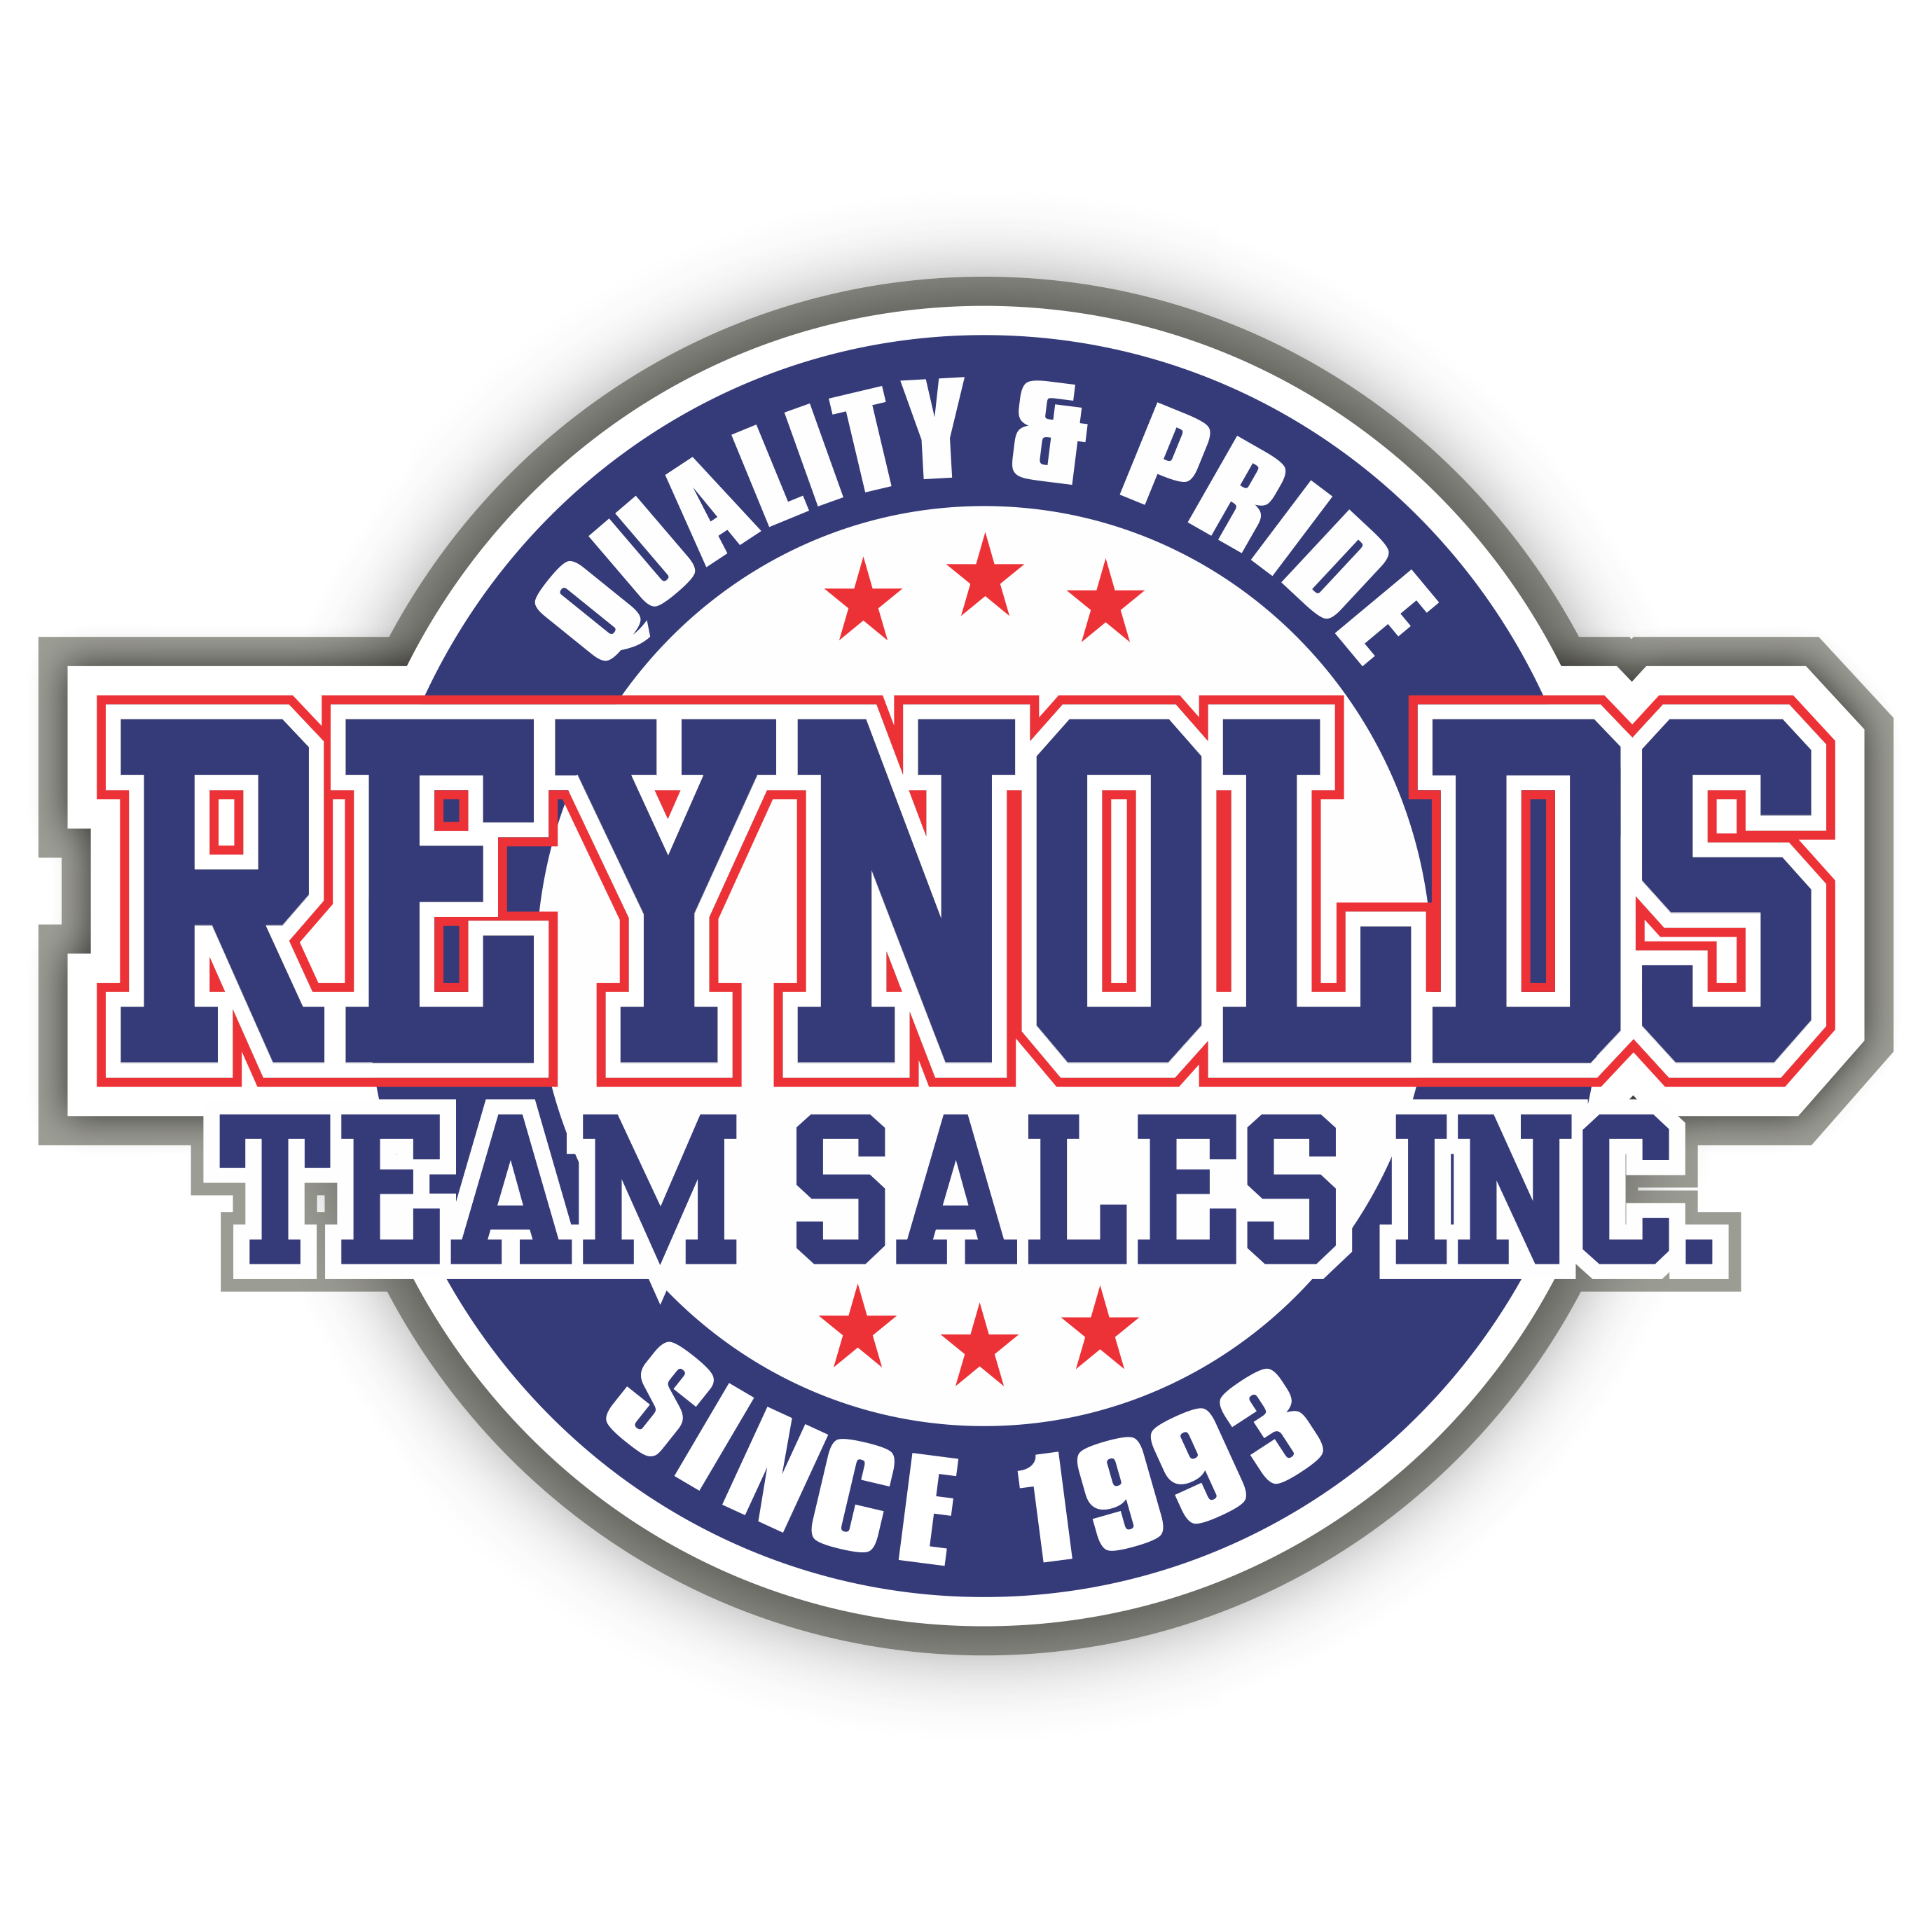 Reynolds Team Sales Inc.